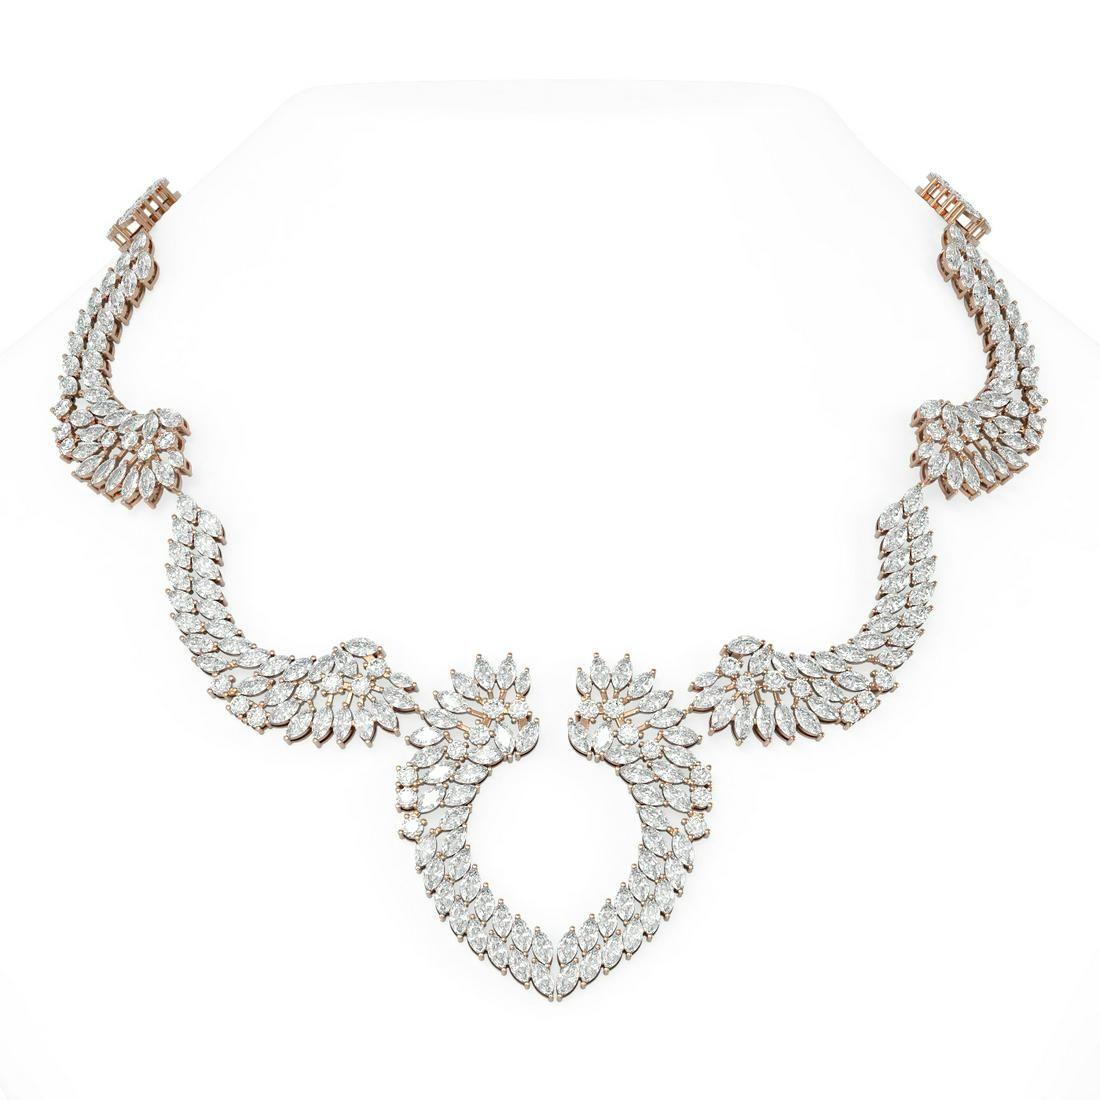 82 ctw Diamond Necklace 18K Rose Gold - REF-10473M3G